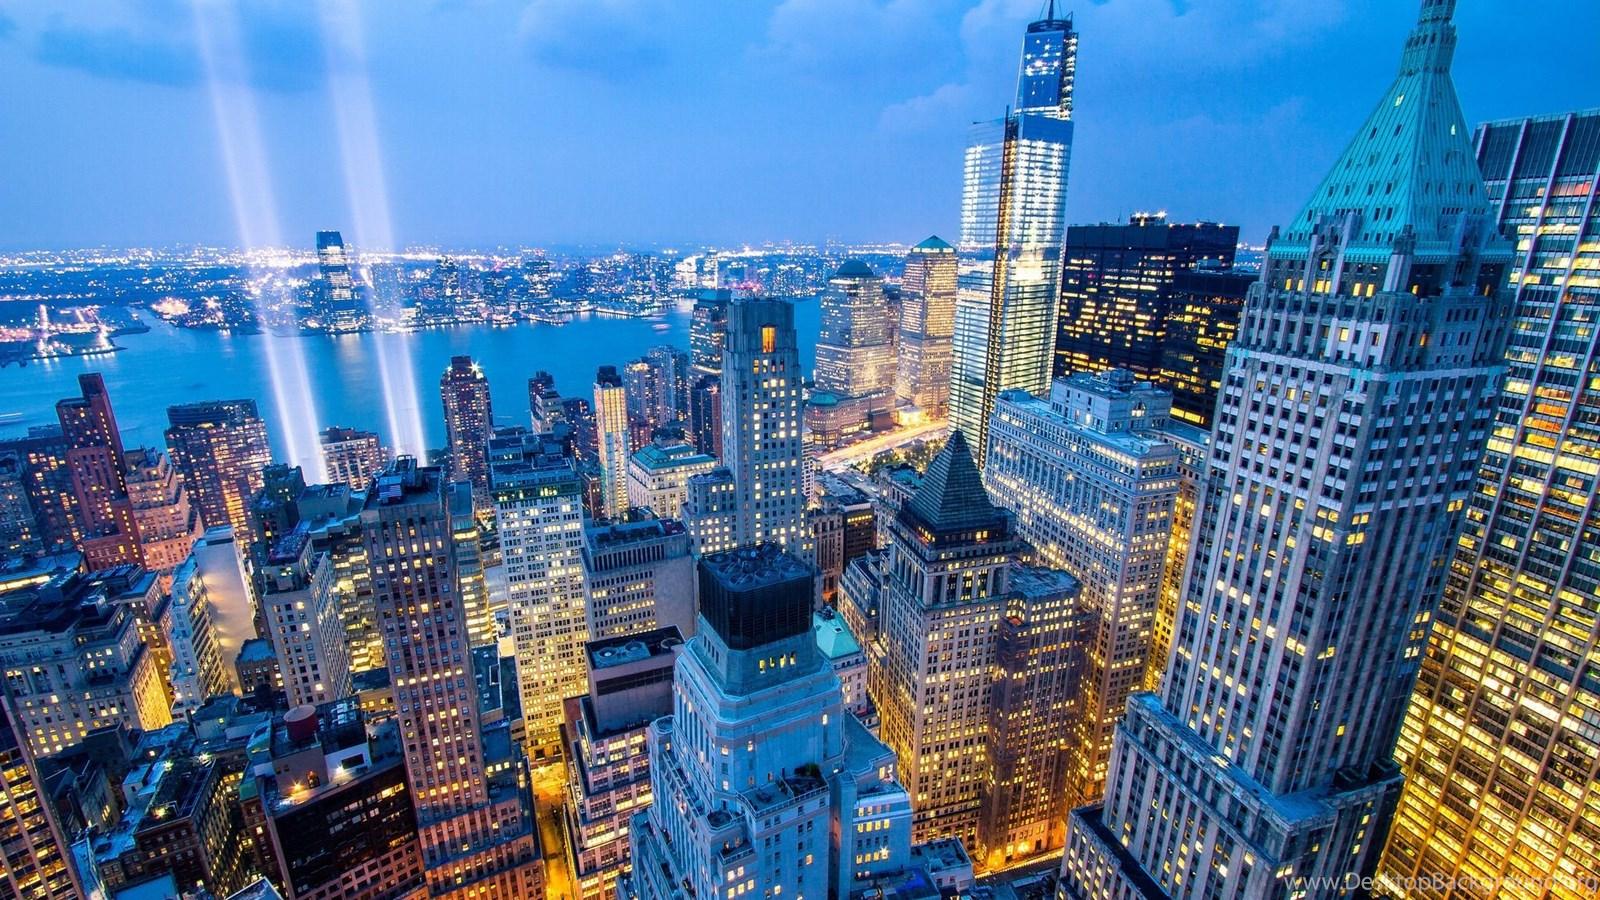 New York City New York Night City Skyline Buildings